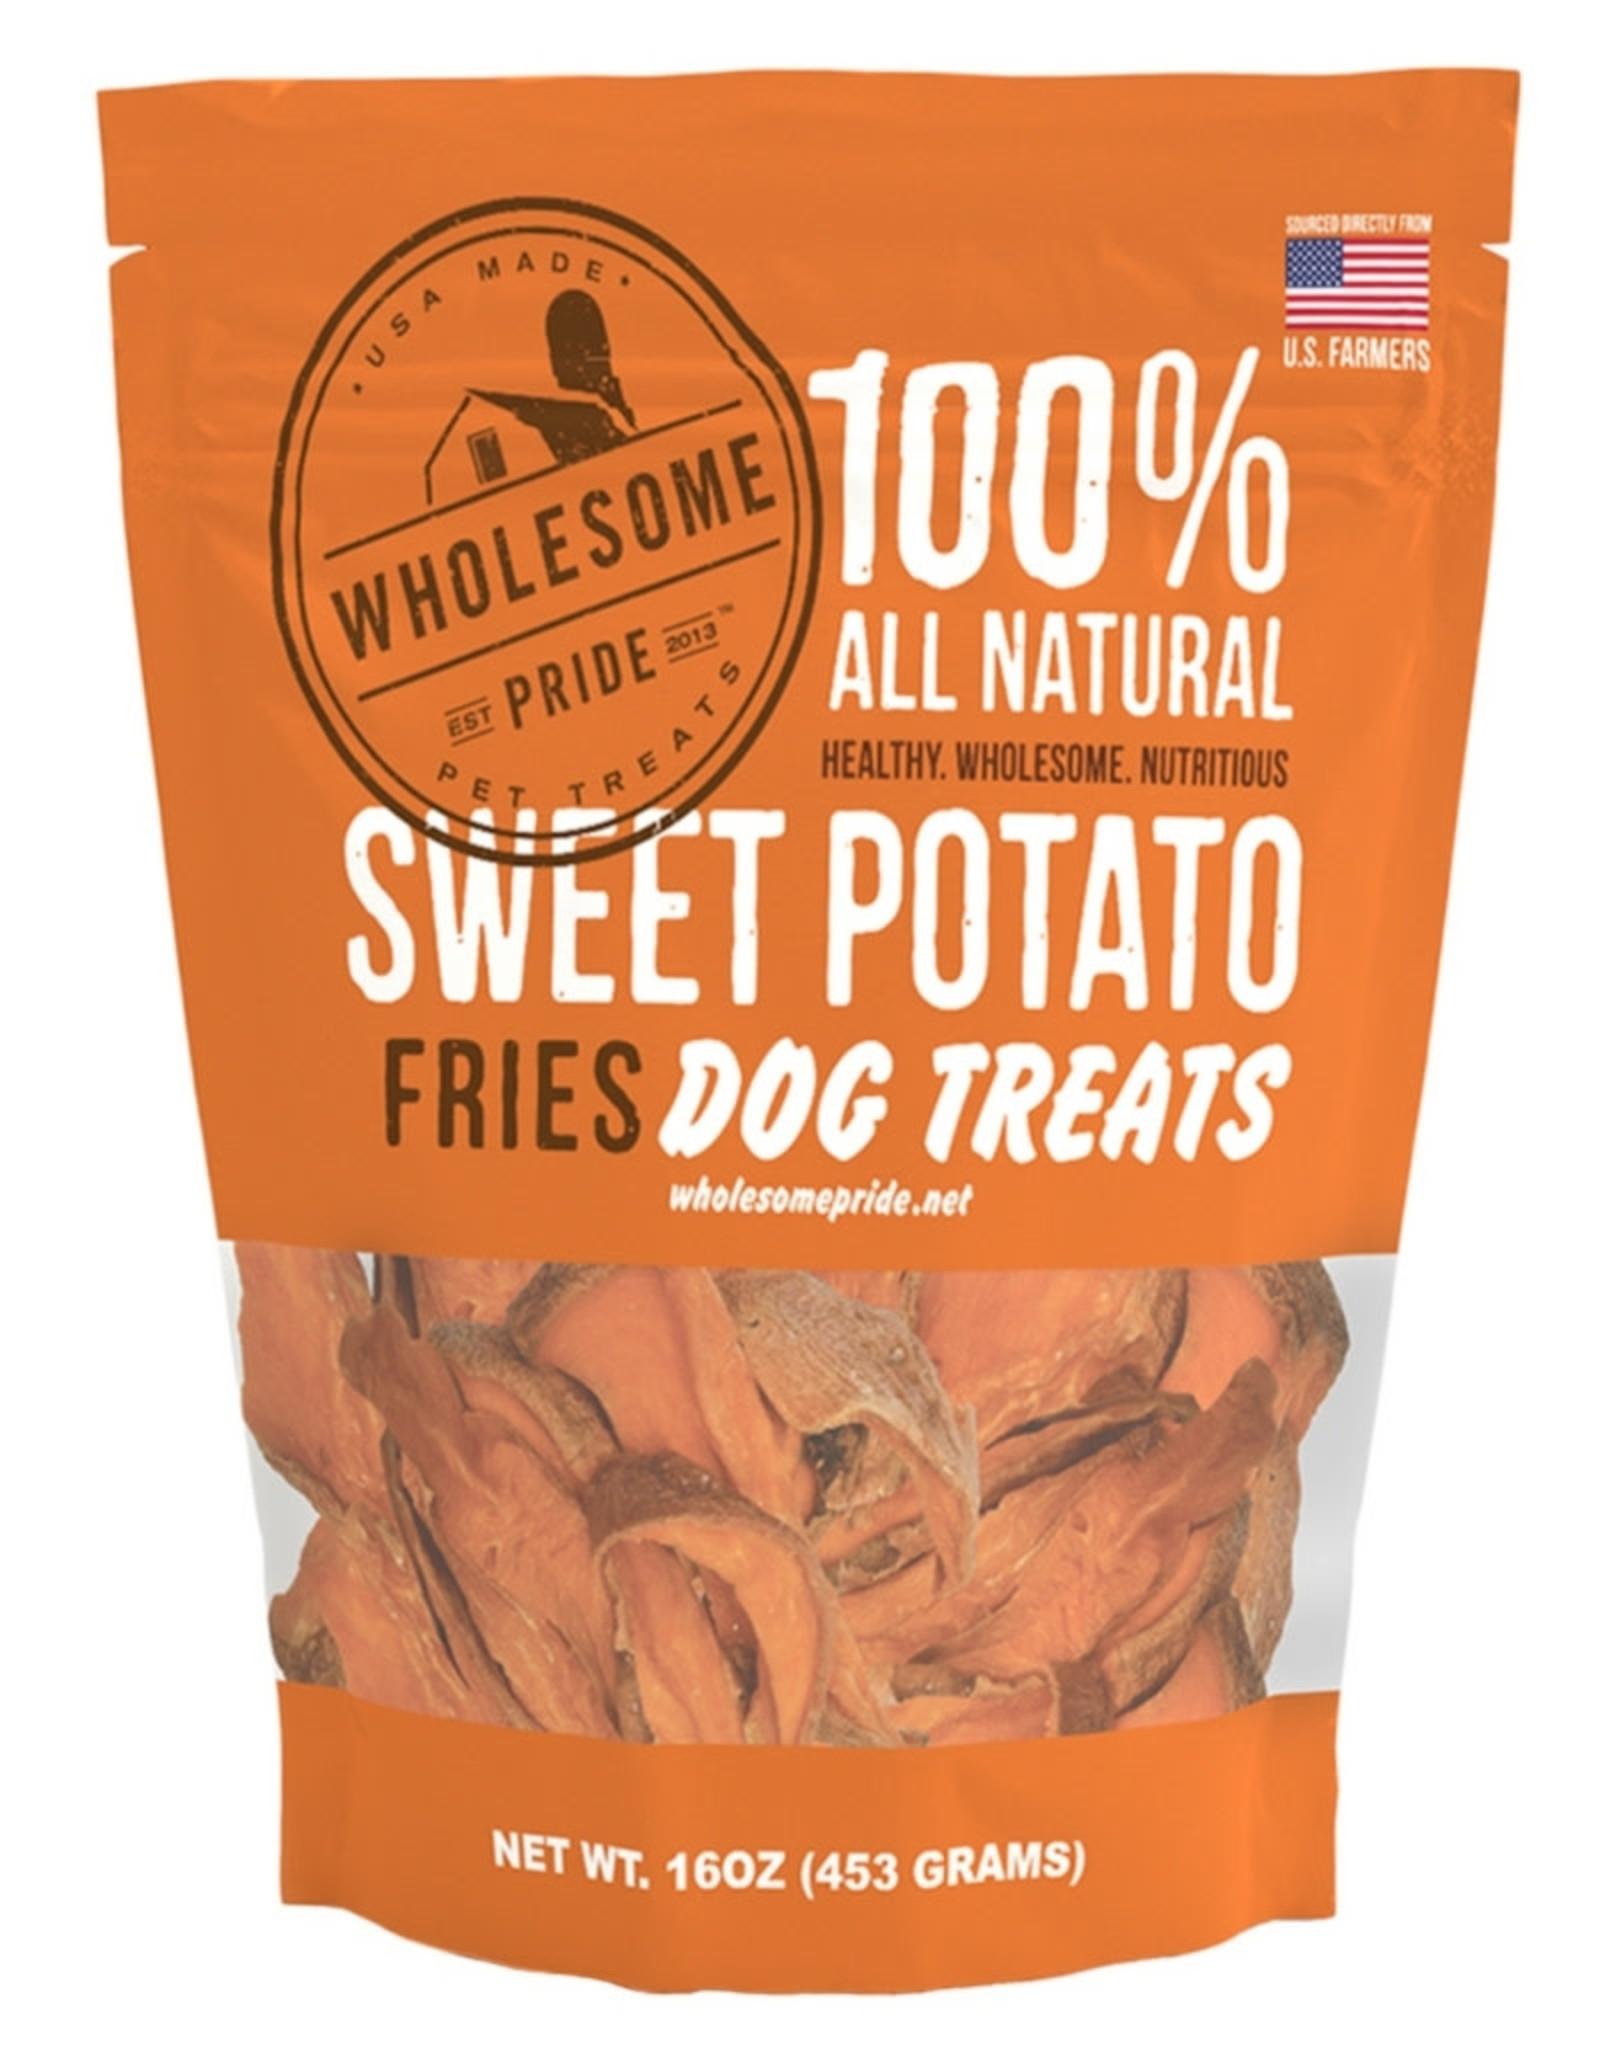 Wholesome Pride Sweet Potato Fries XMAS Dog Treats